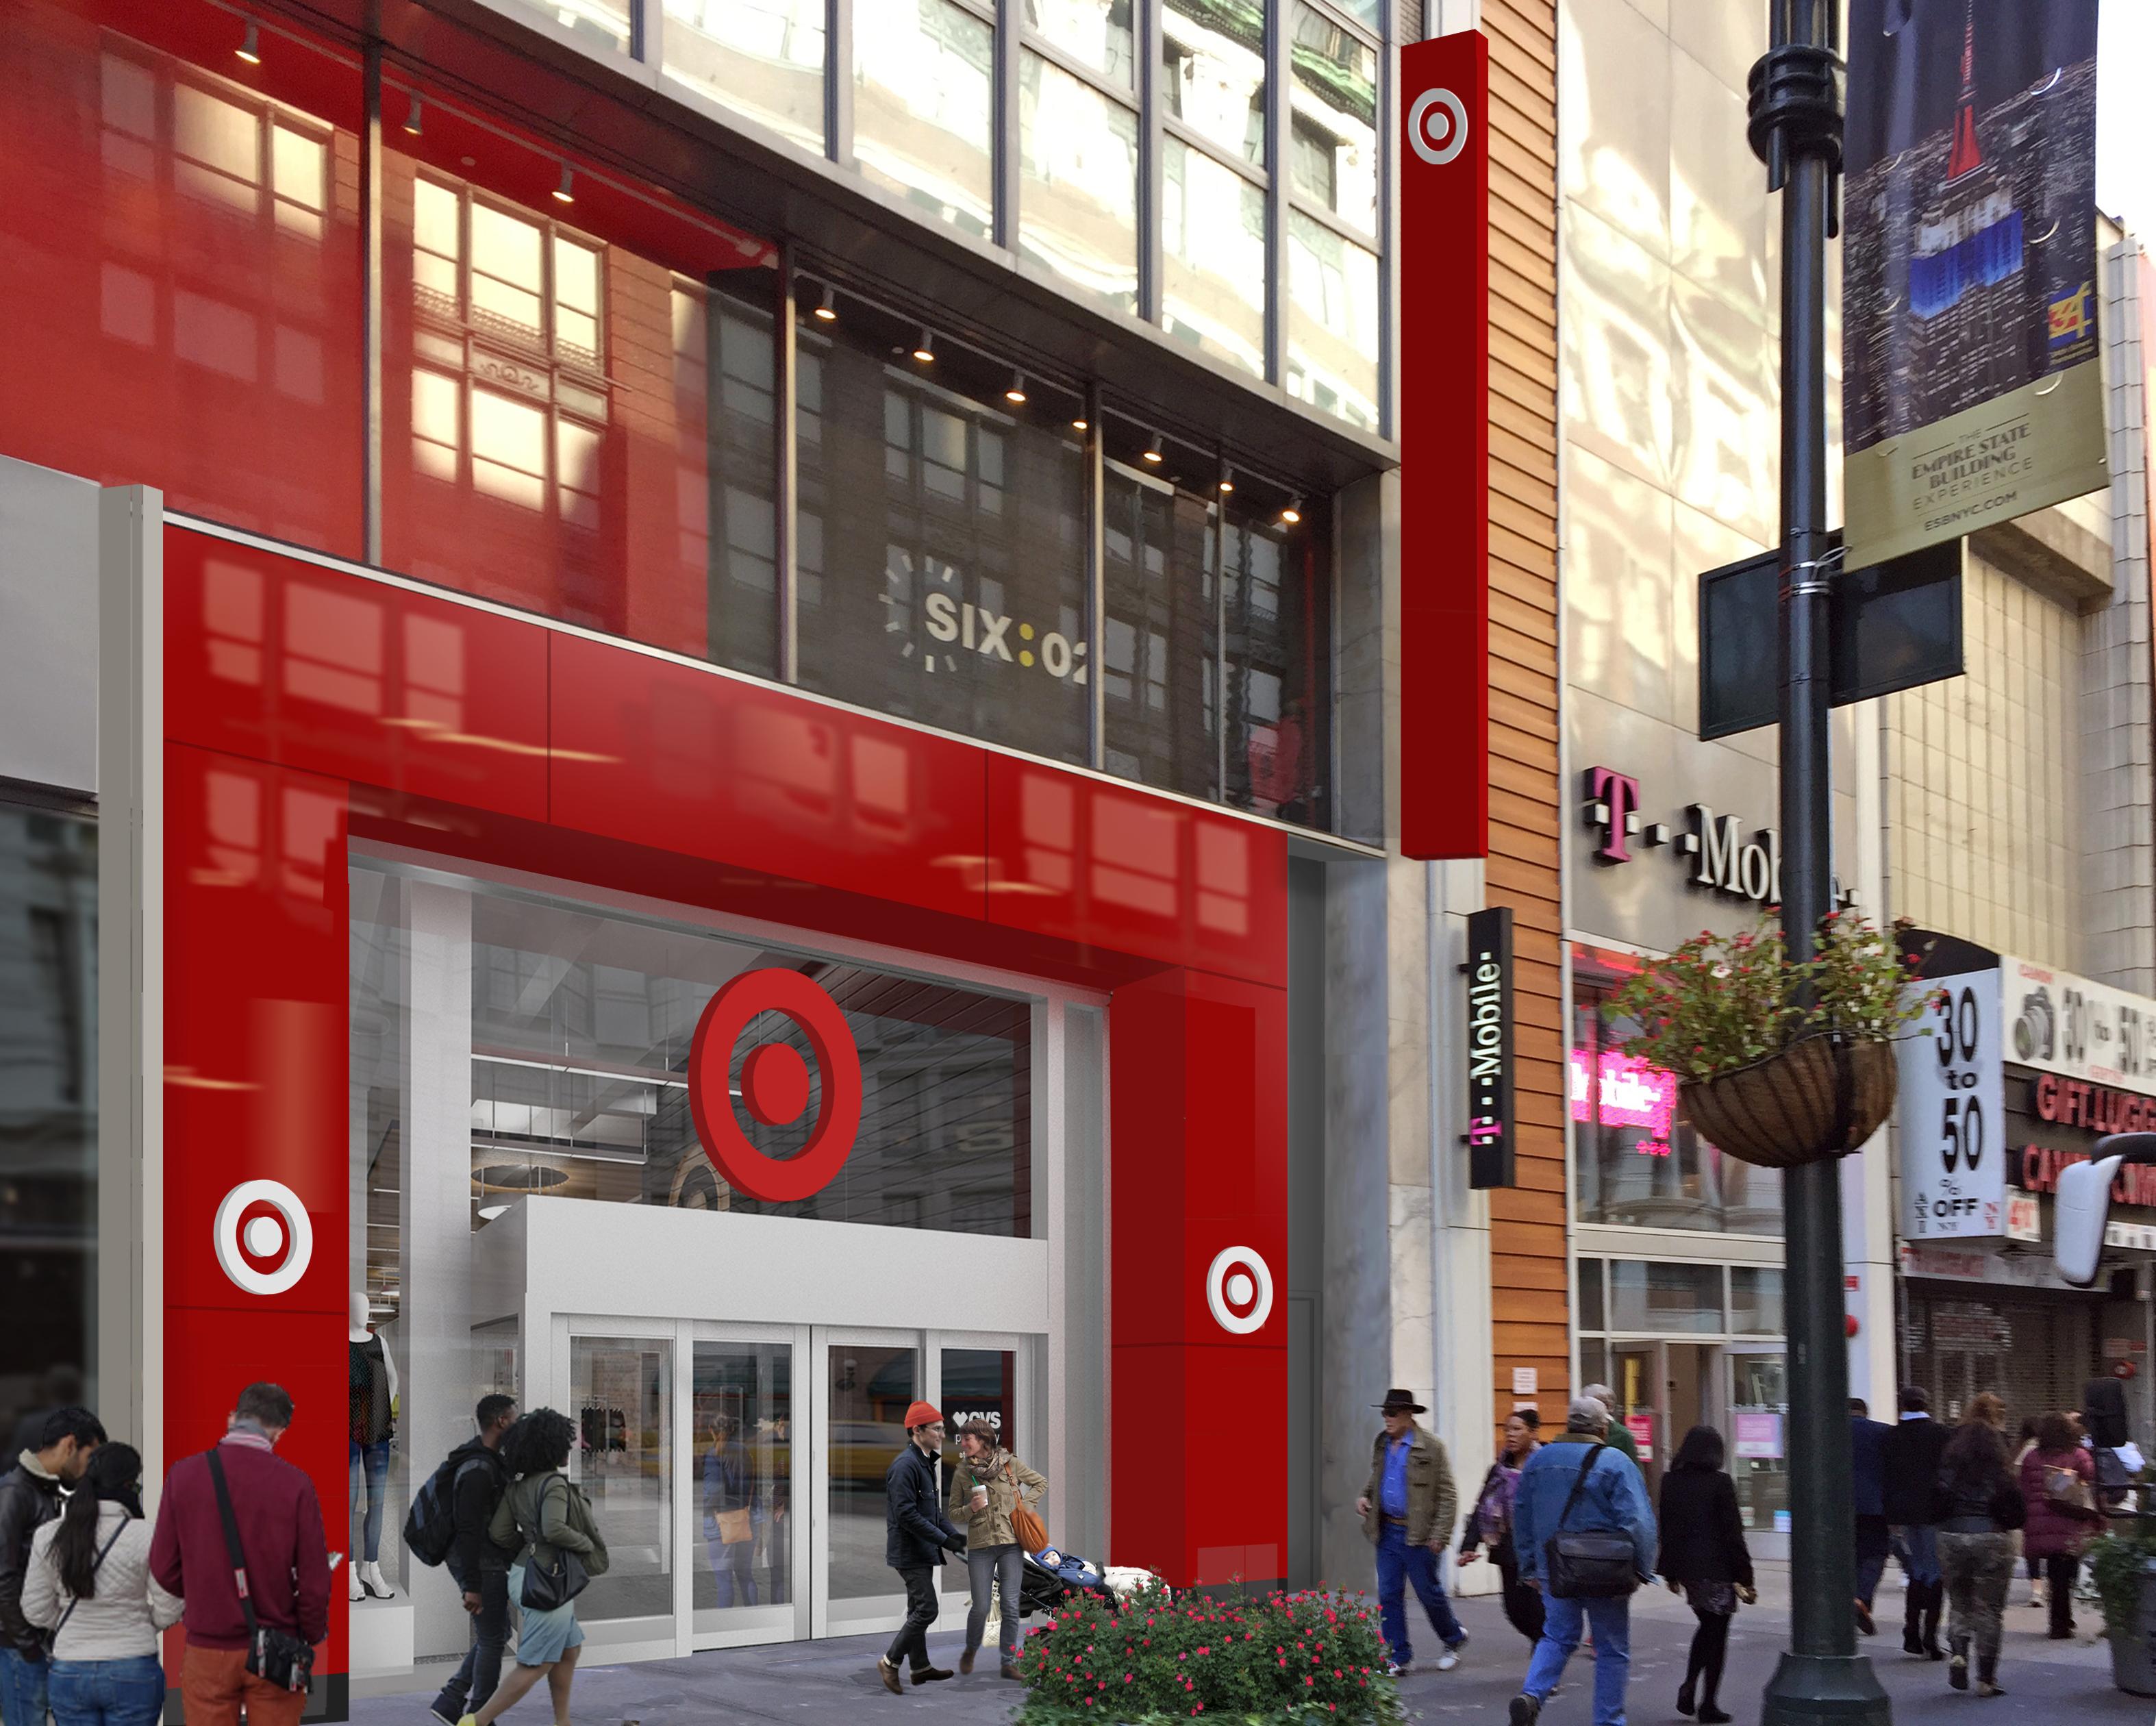 Rendering of the Target in Midtown Manhattan. Courtesy of Target.